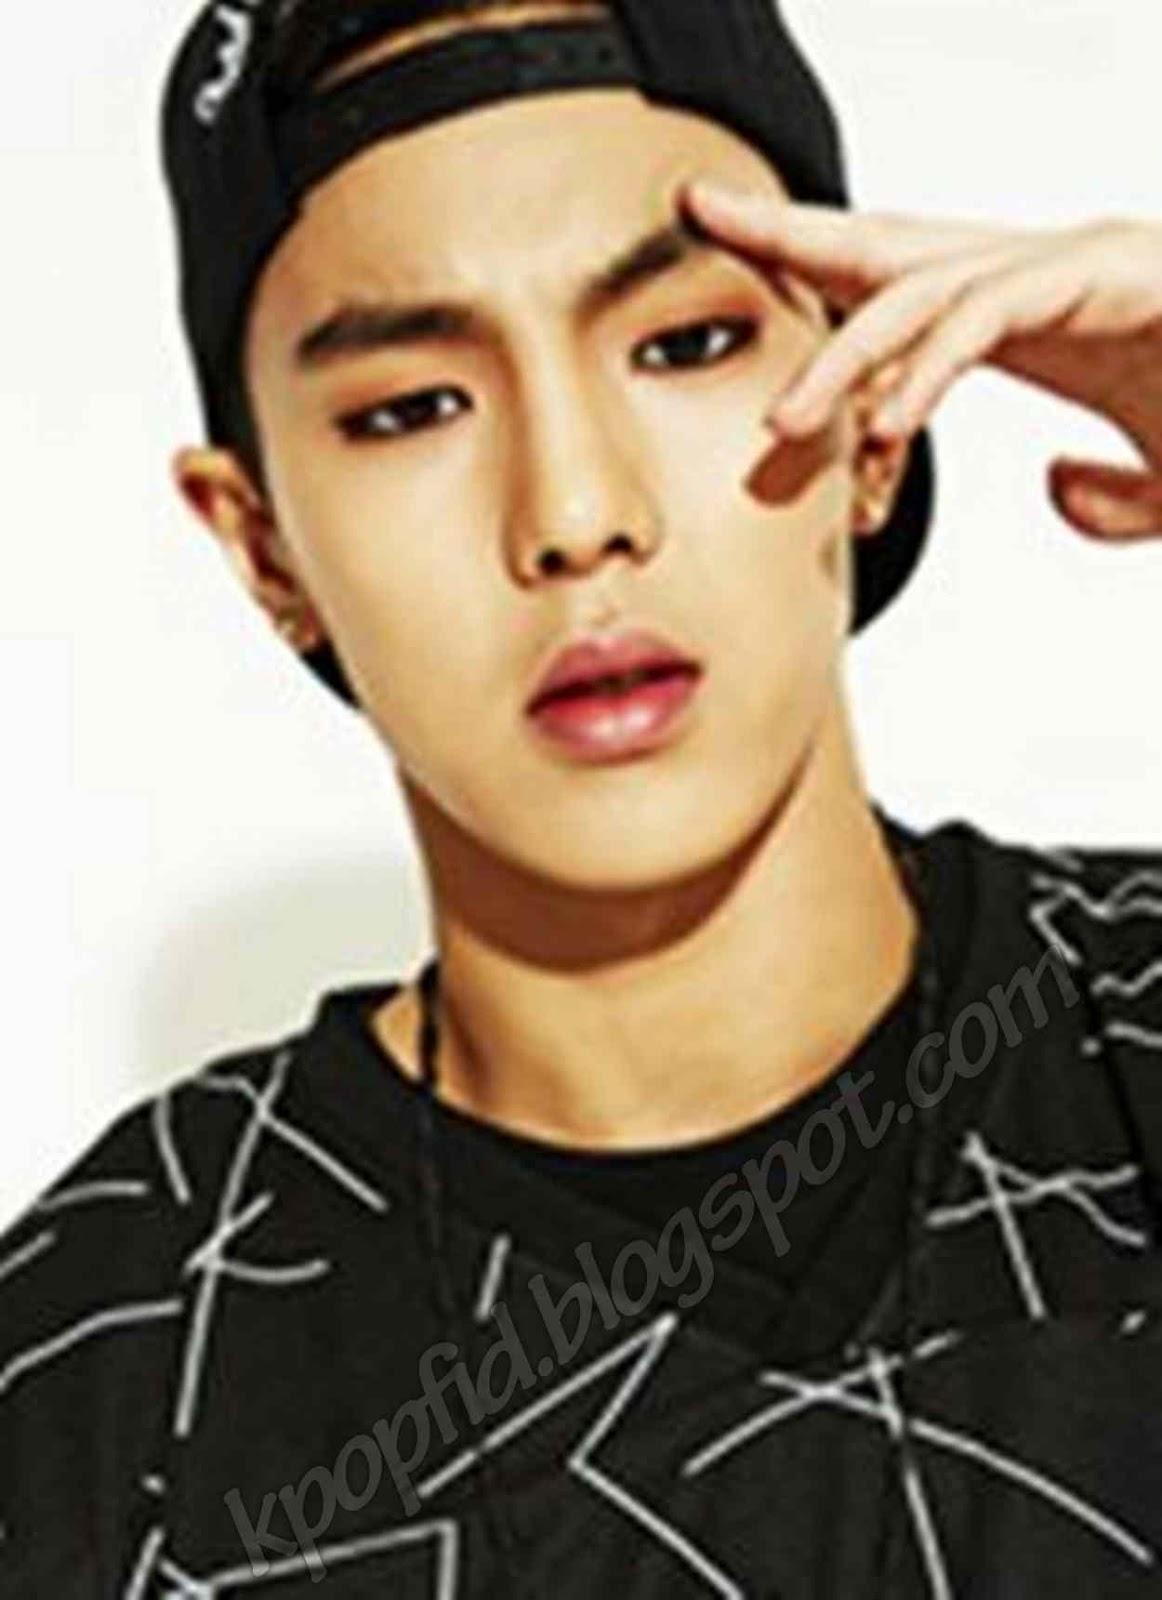 monsta x profile members biodata member monsta x shownu monsta x photos som hyun woo